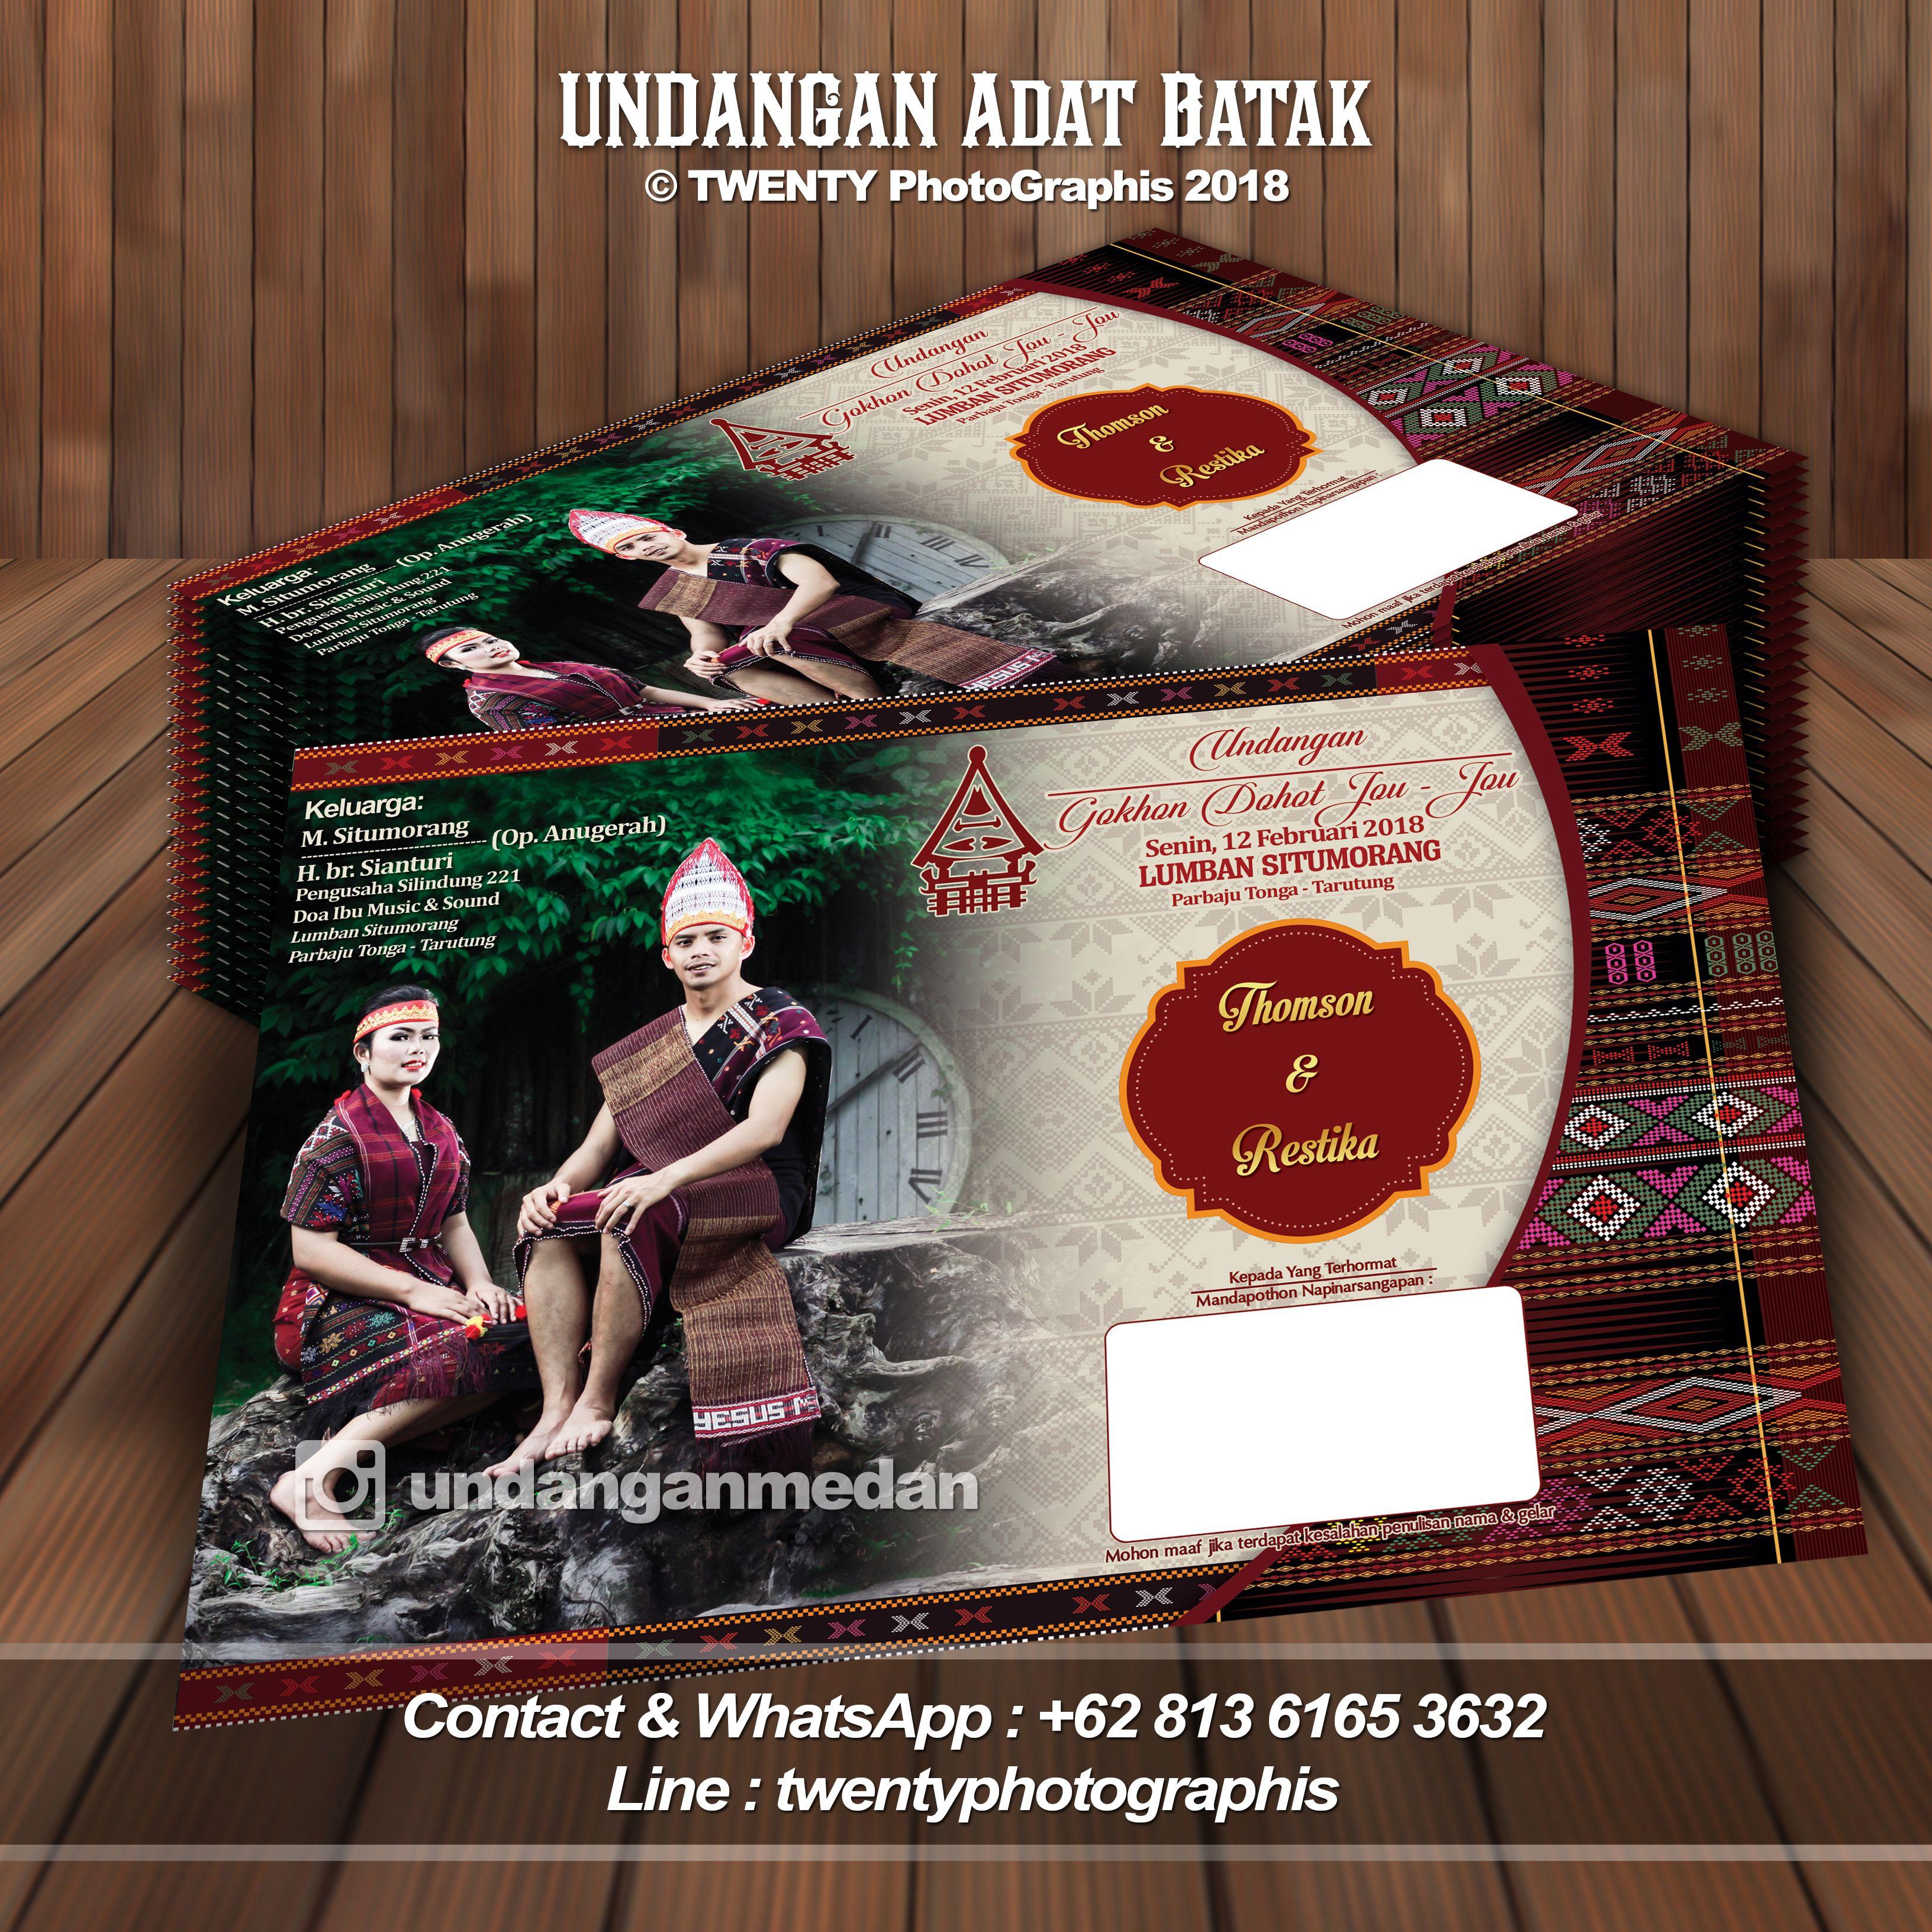 Undangan Adat Batak Pinterest Photo And Jawa Medan Video